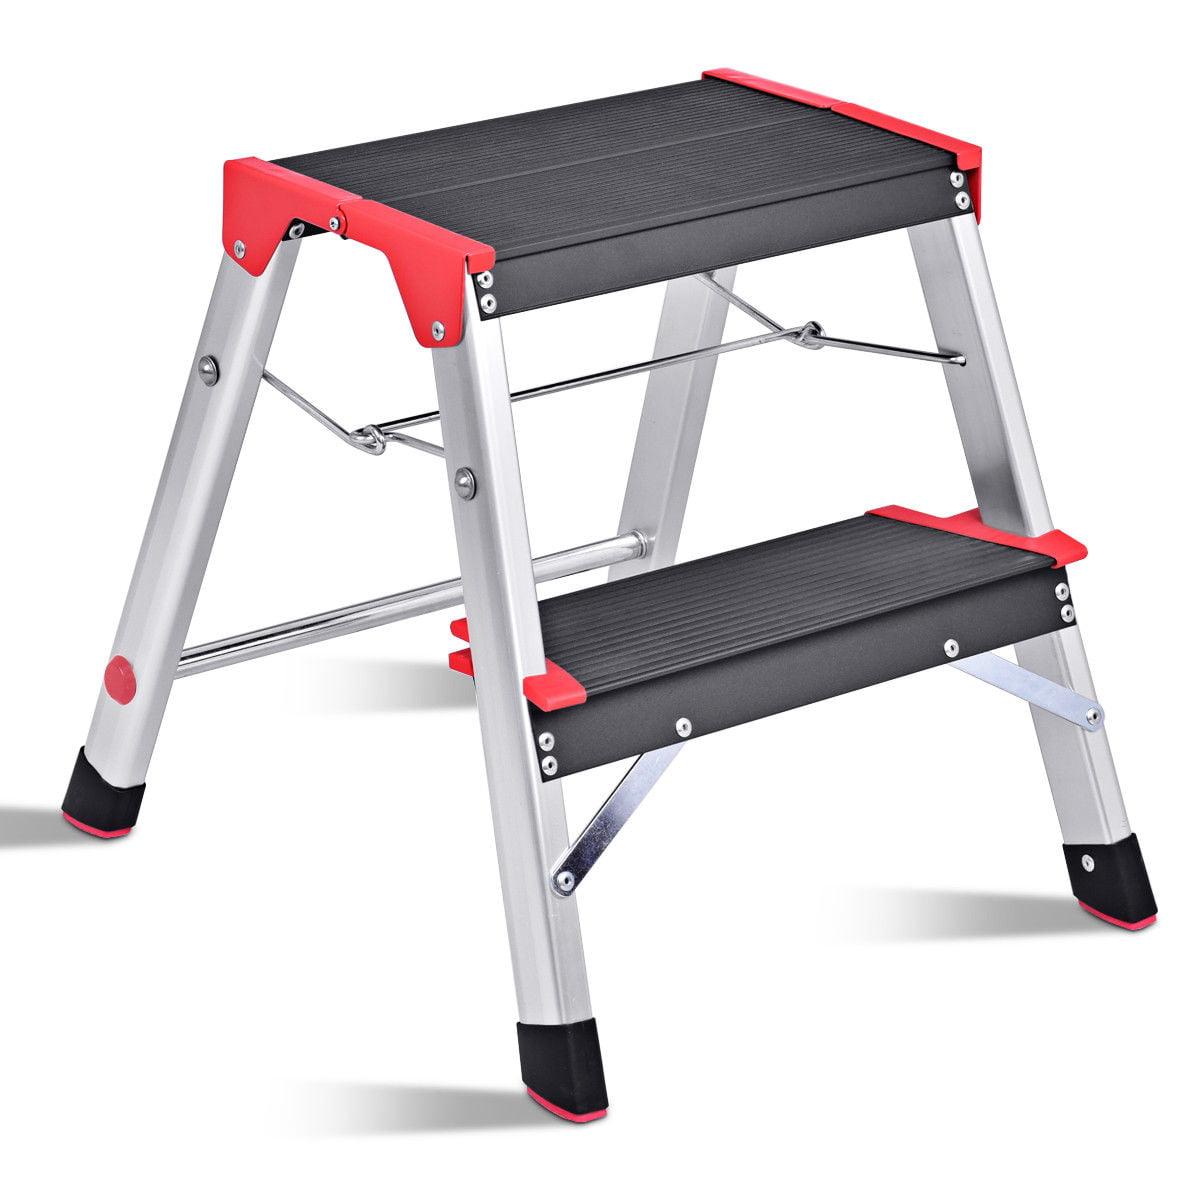 Costway 2 Step Aluminum Lightweight Ladder Folding Non Slip Platform Stool 330lbs Load Walmart Com Walmart Com